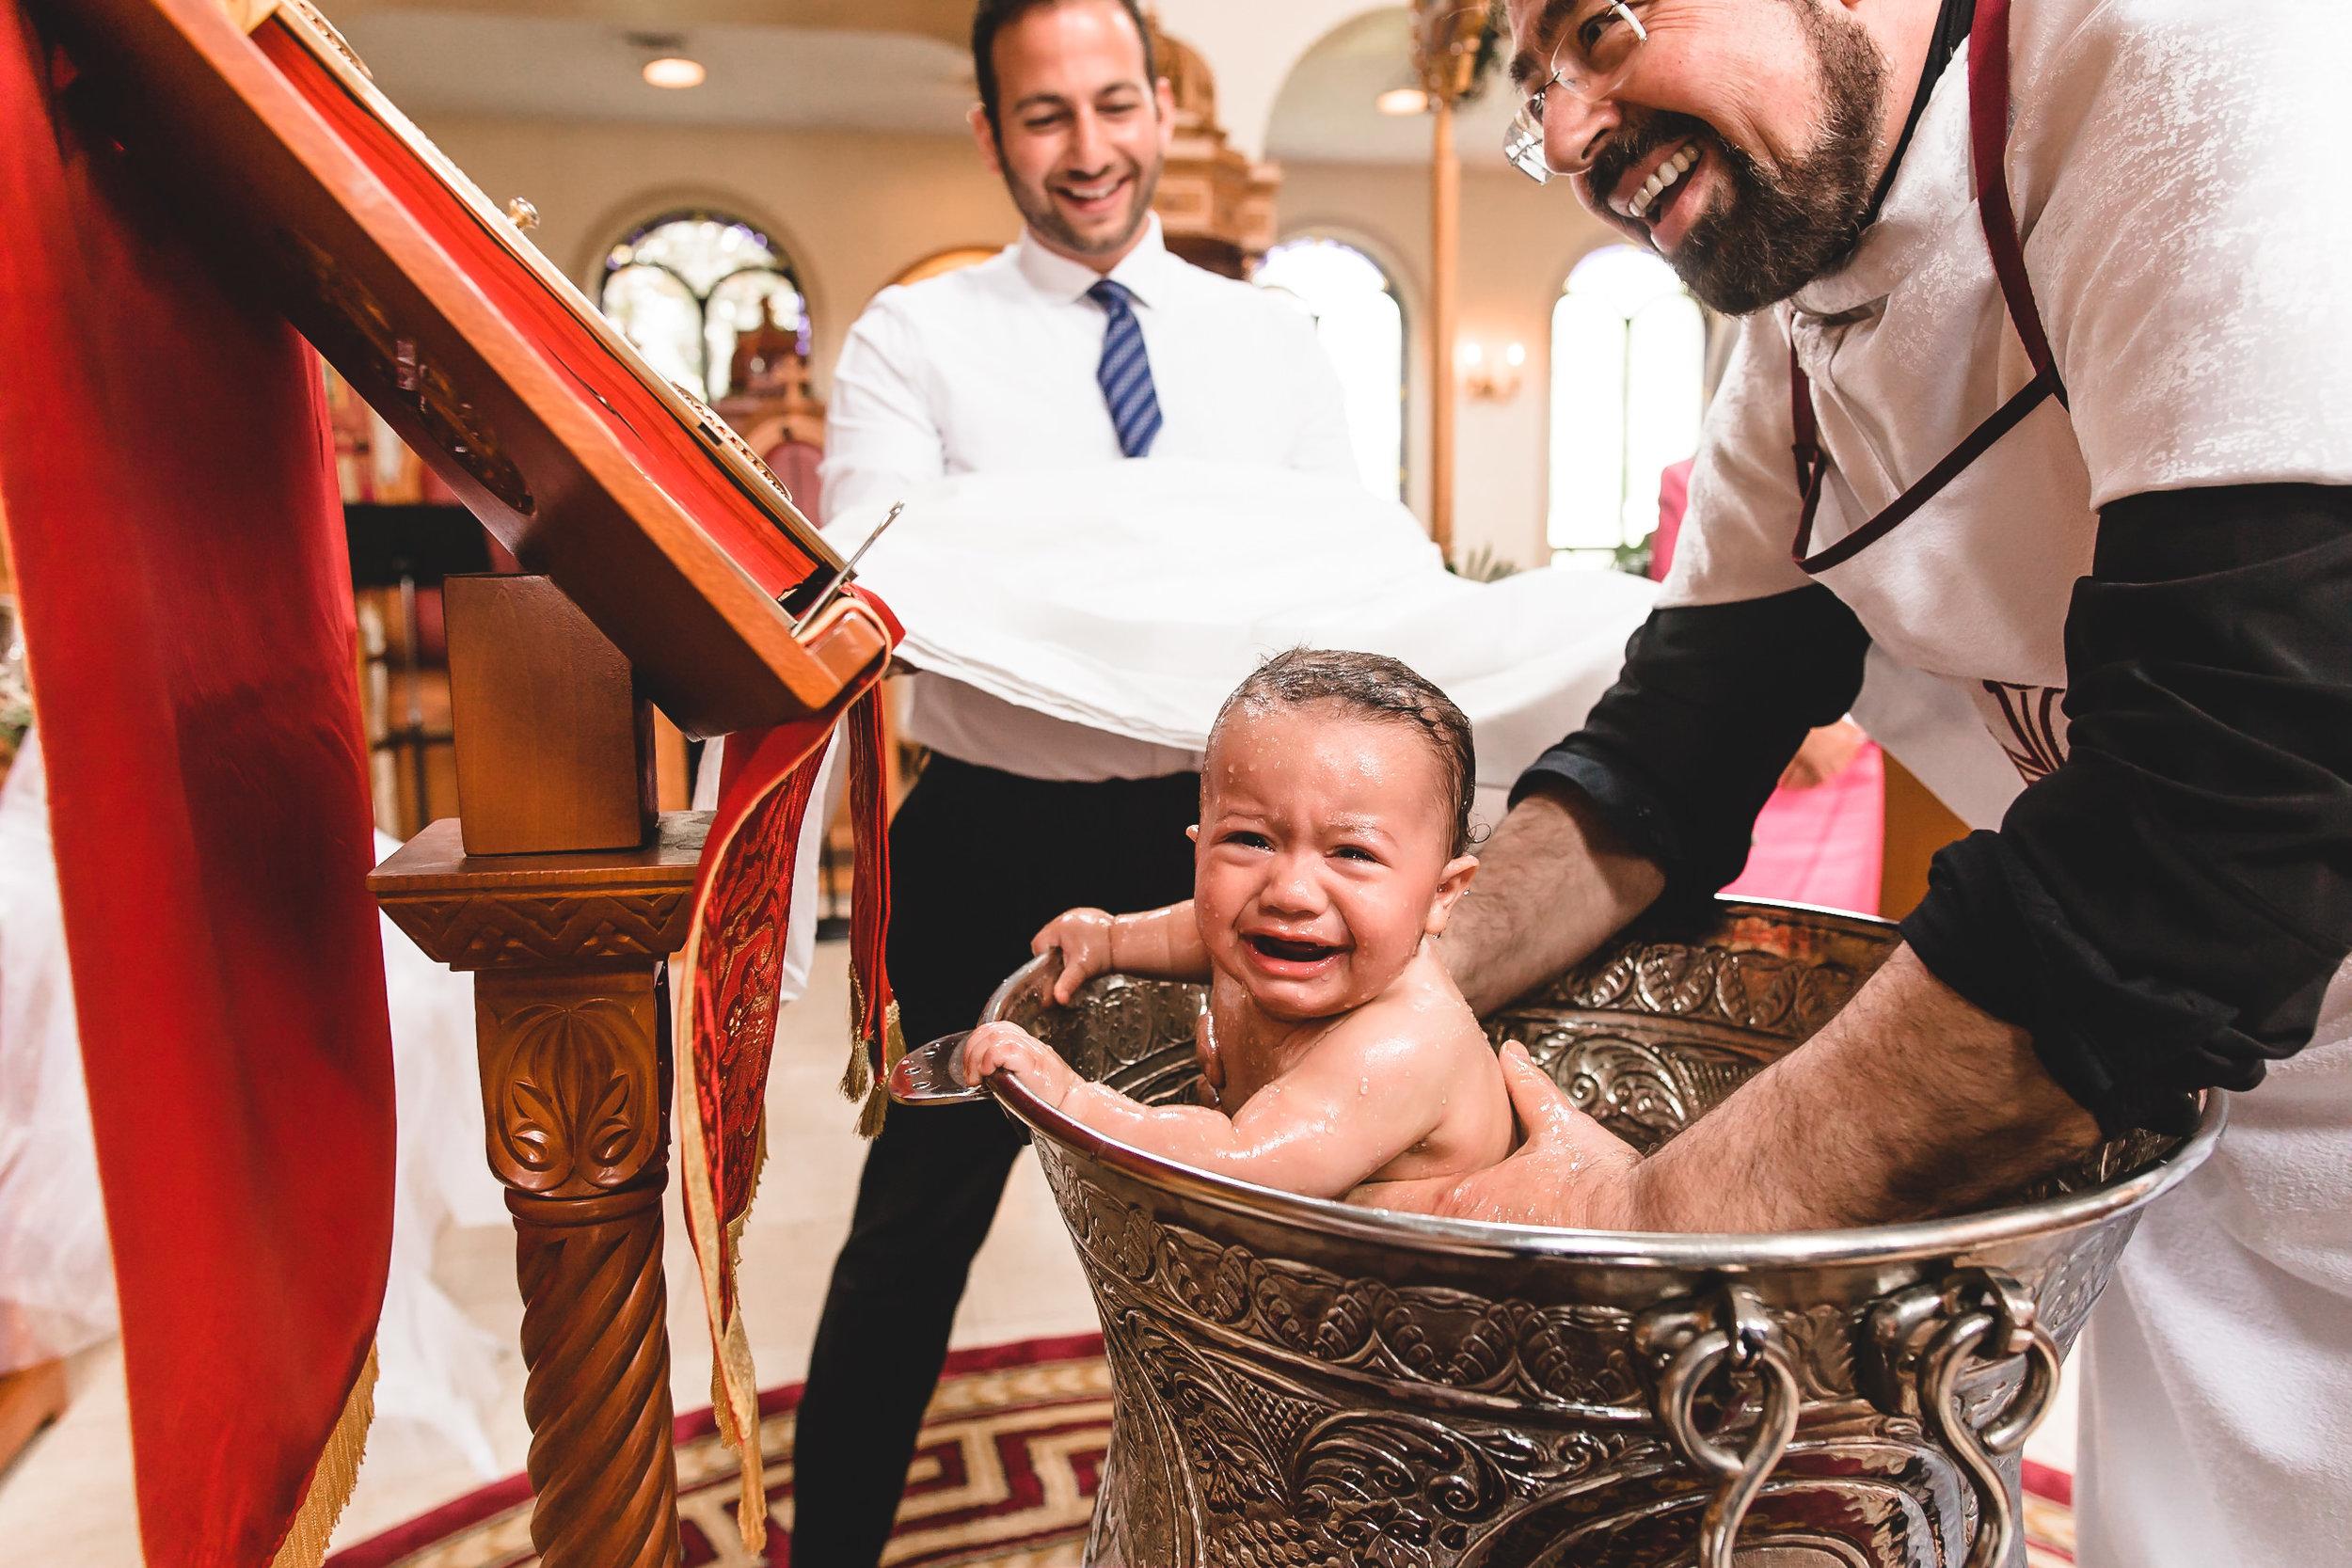 Kimisis Tis Theotokou baptism holmdel nj daniel nydick (16 of 36).jpg